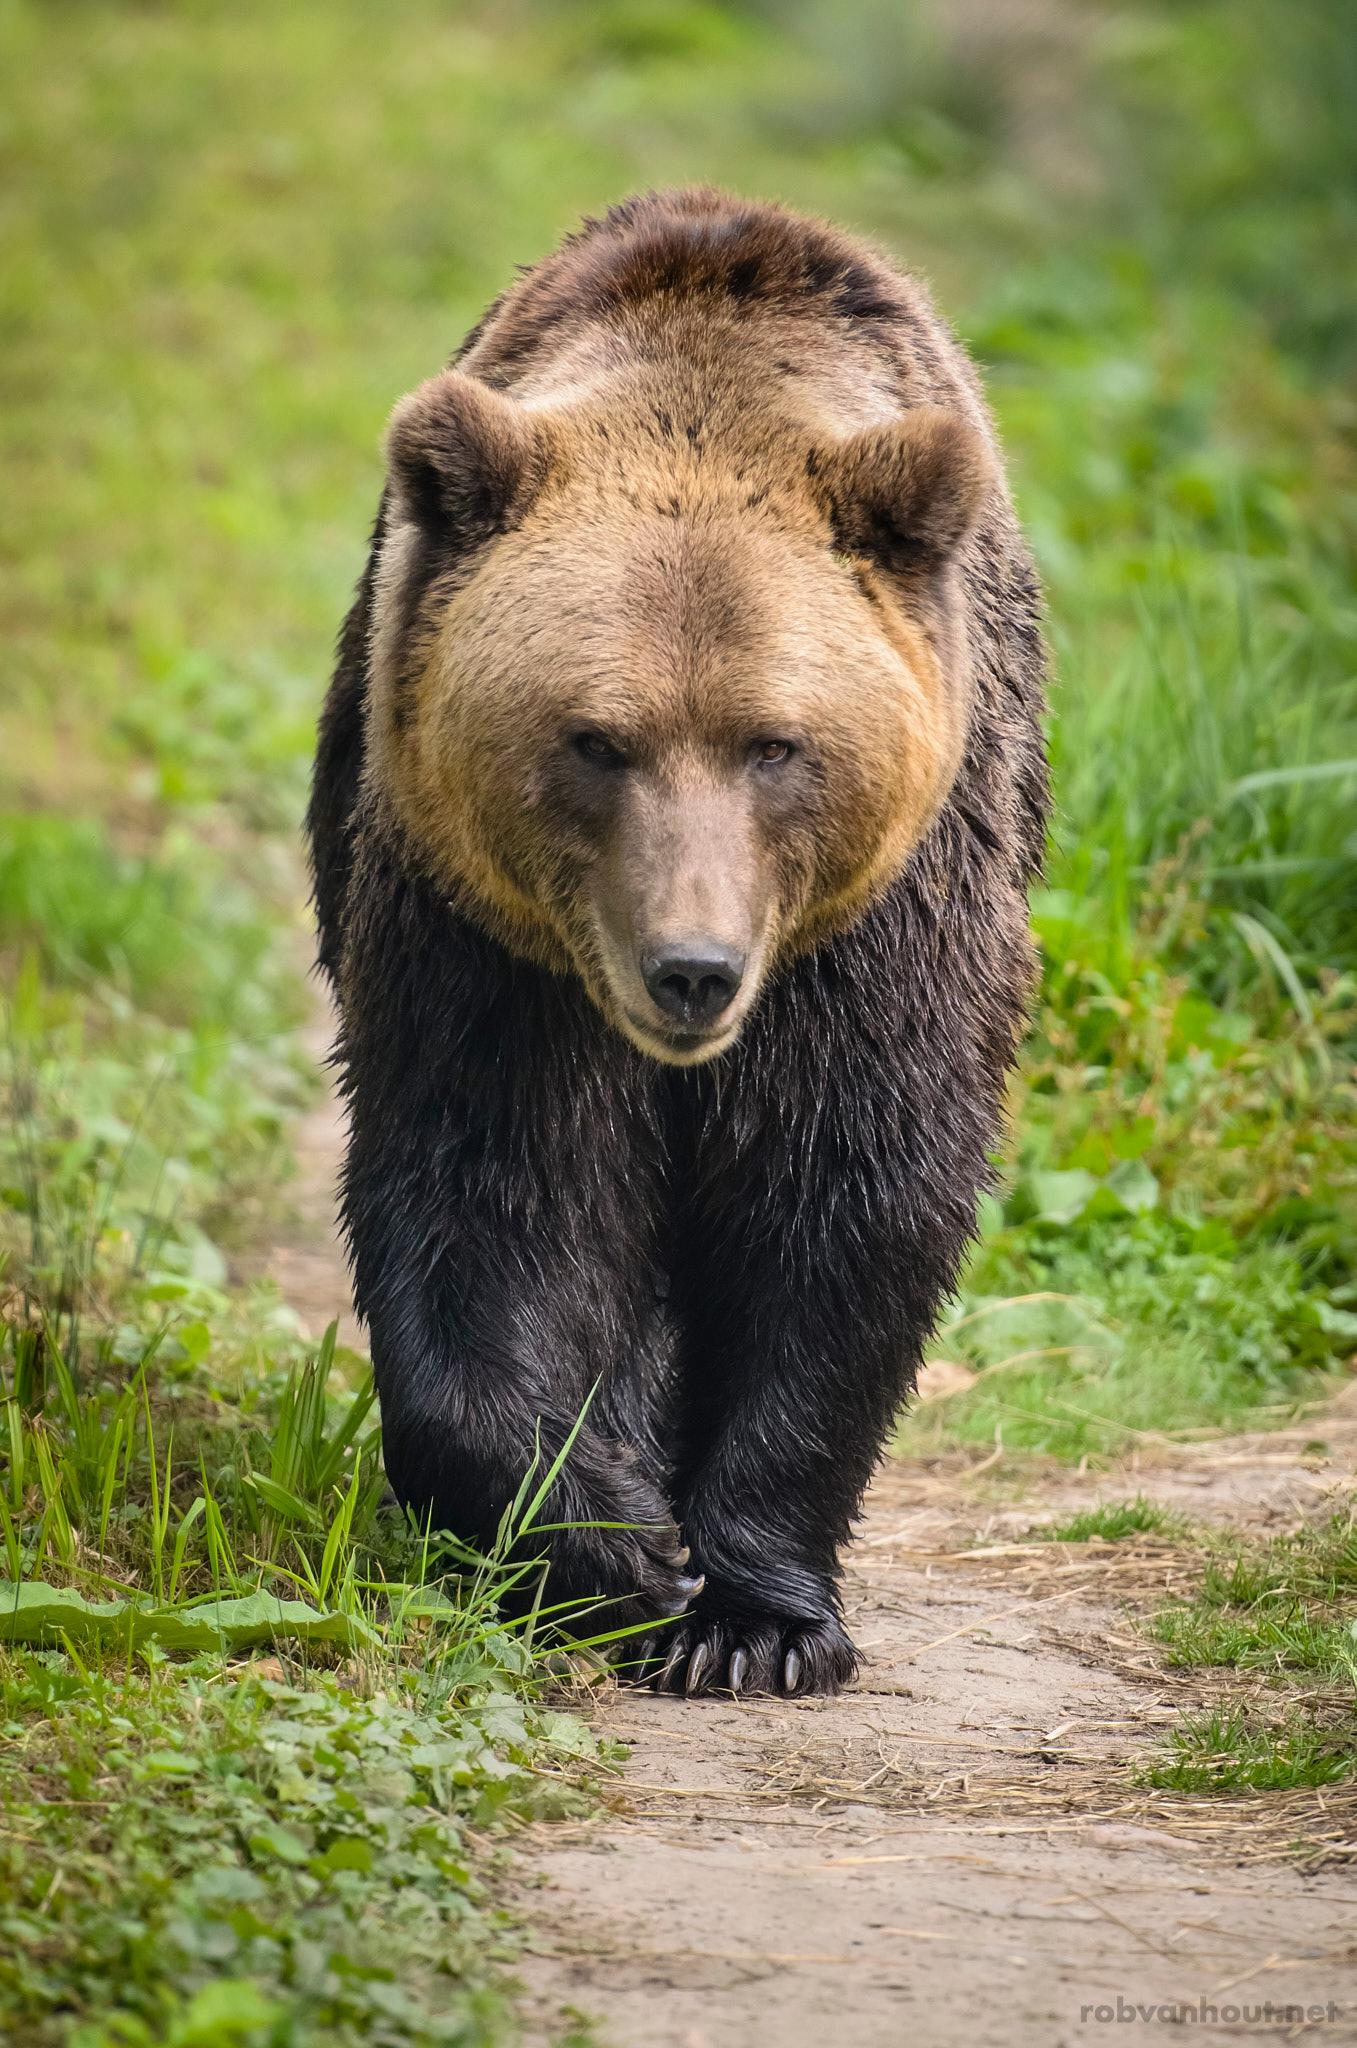 Bear Trail — Bärenwald Müritz